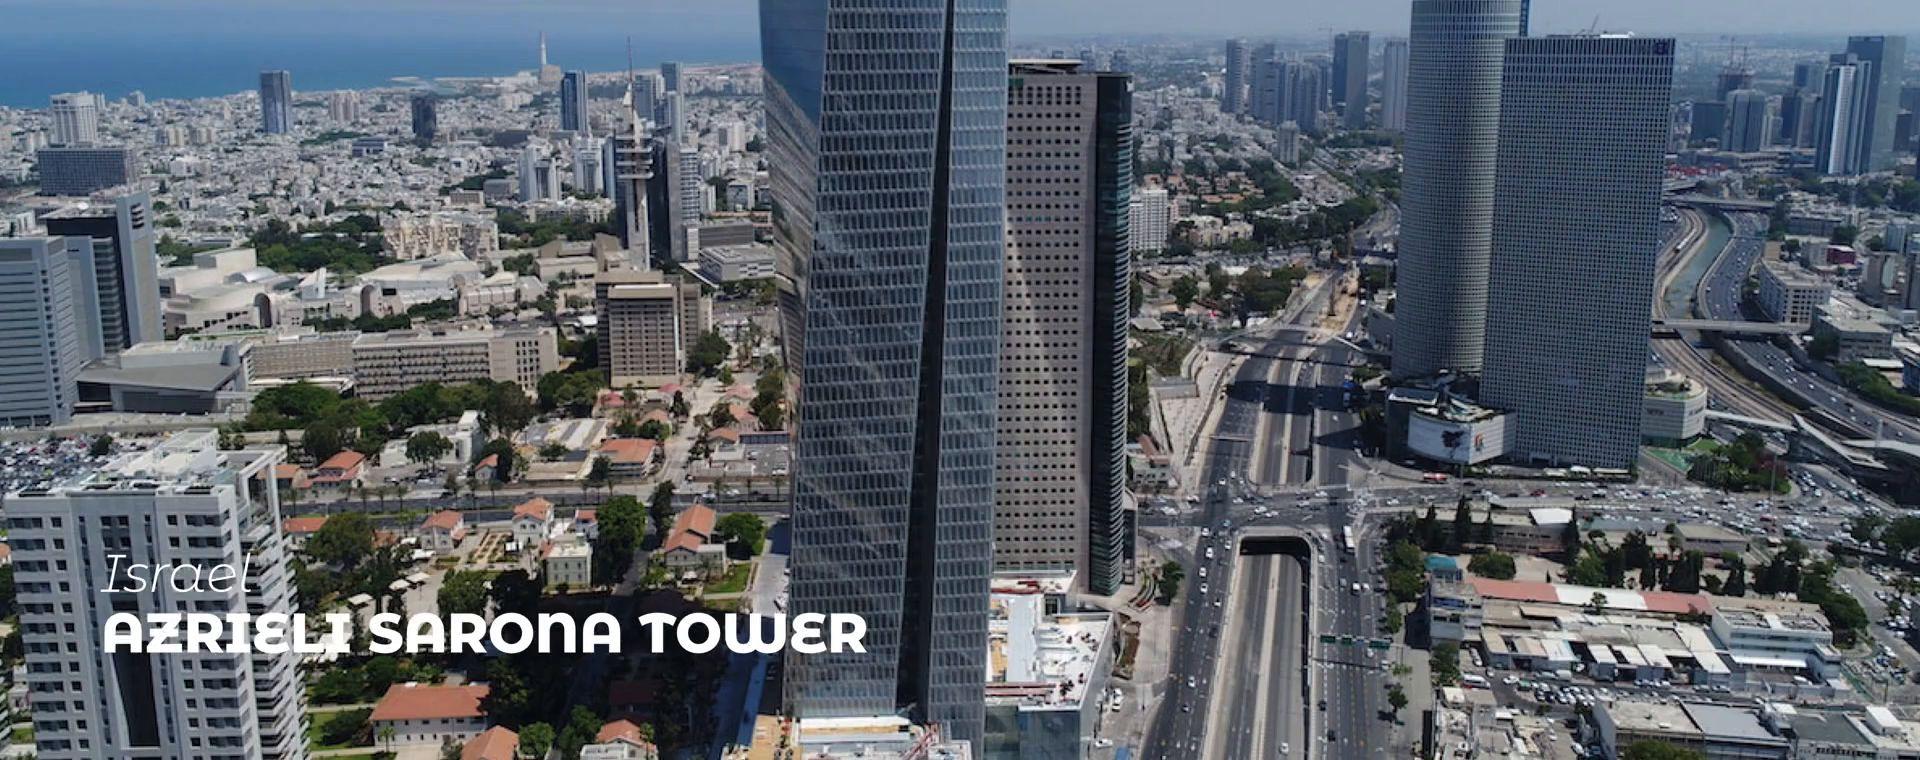 AZRIELI SARONA TOWER